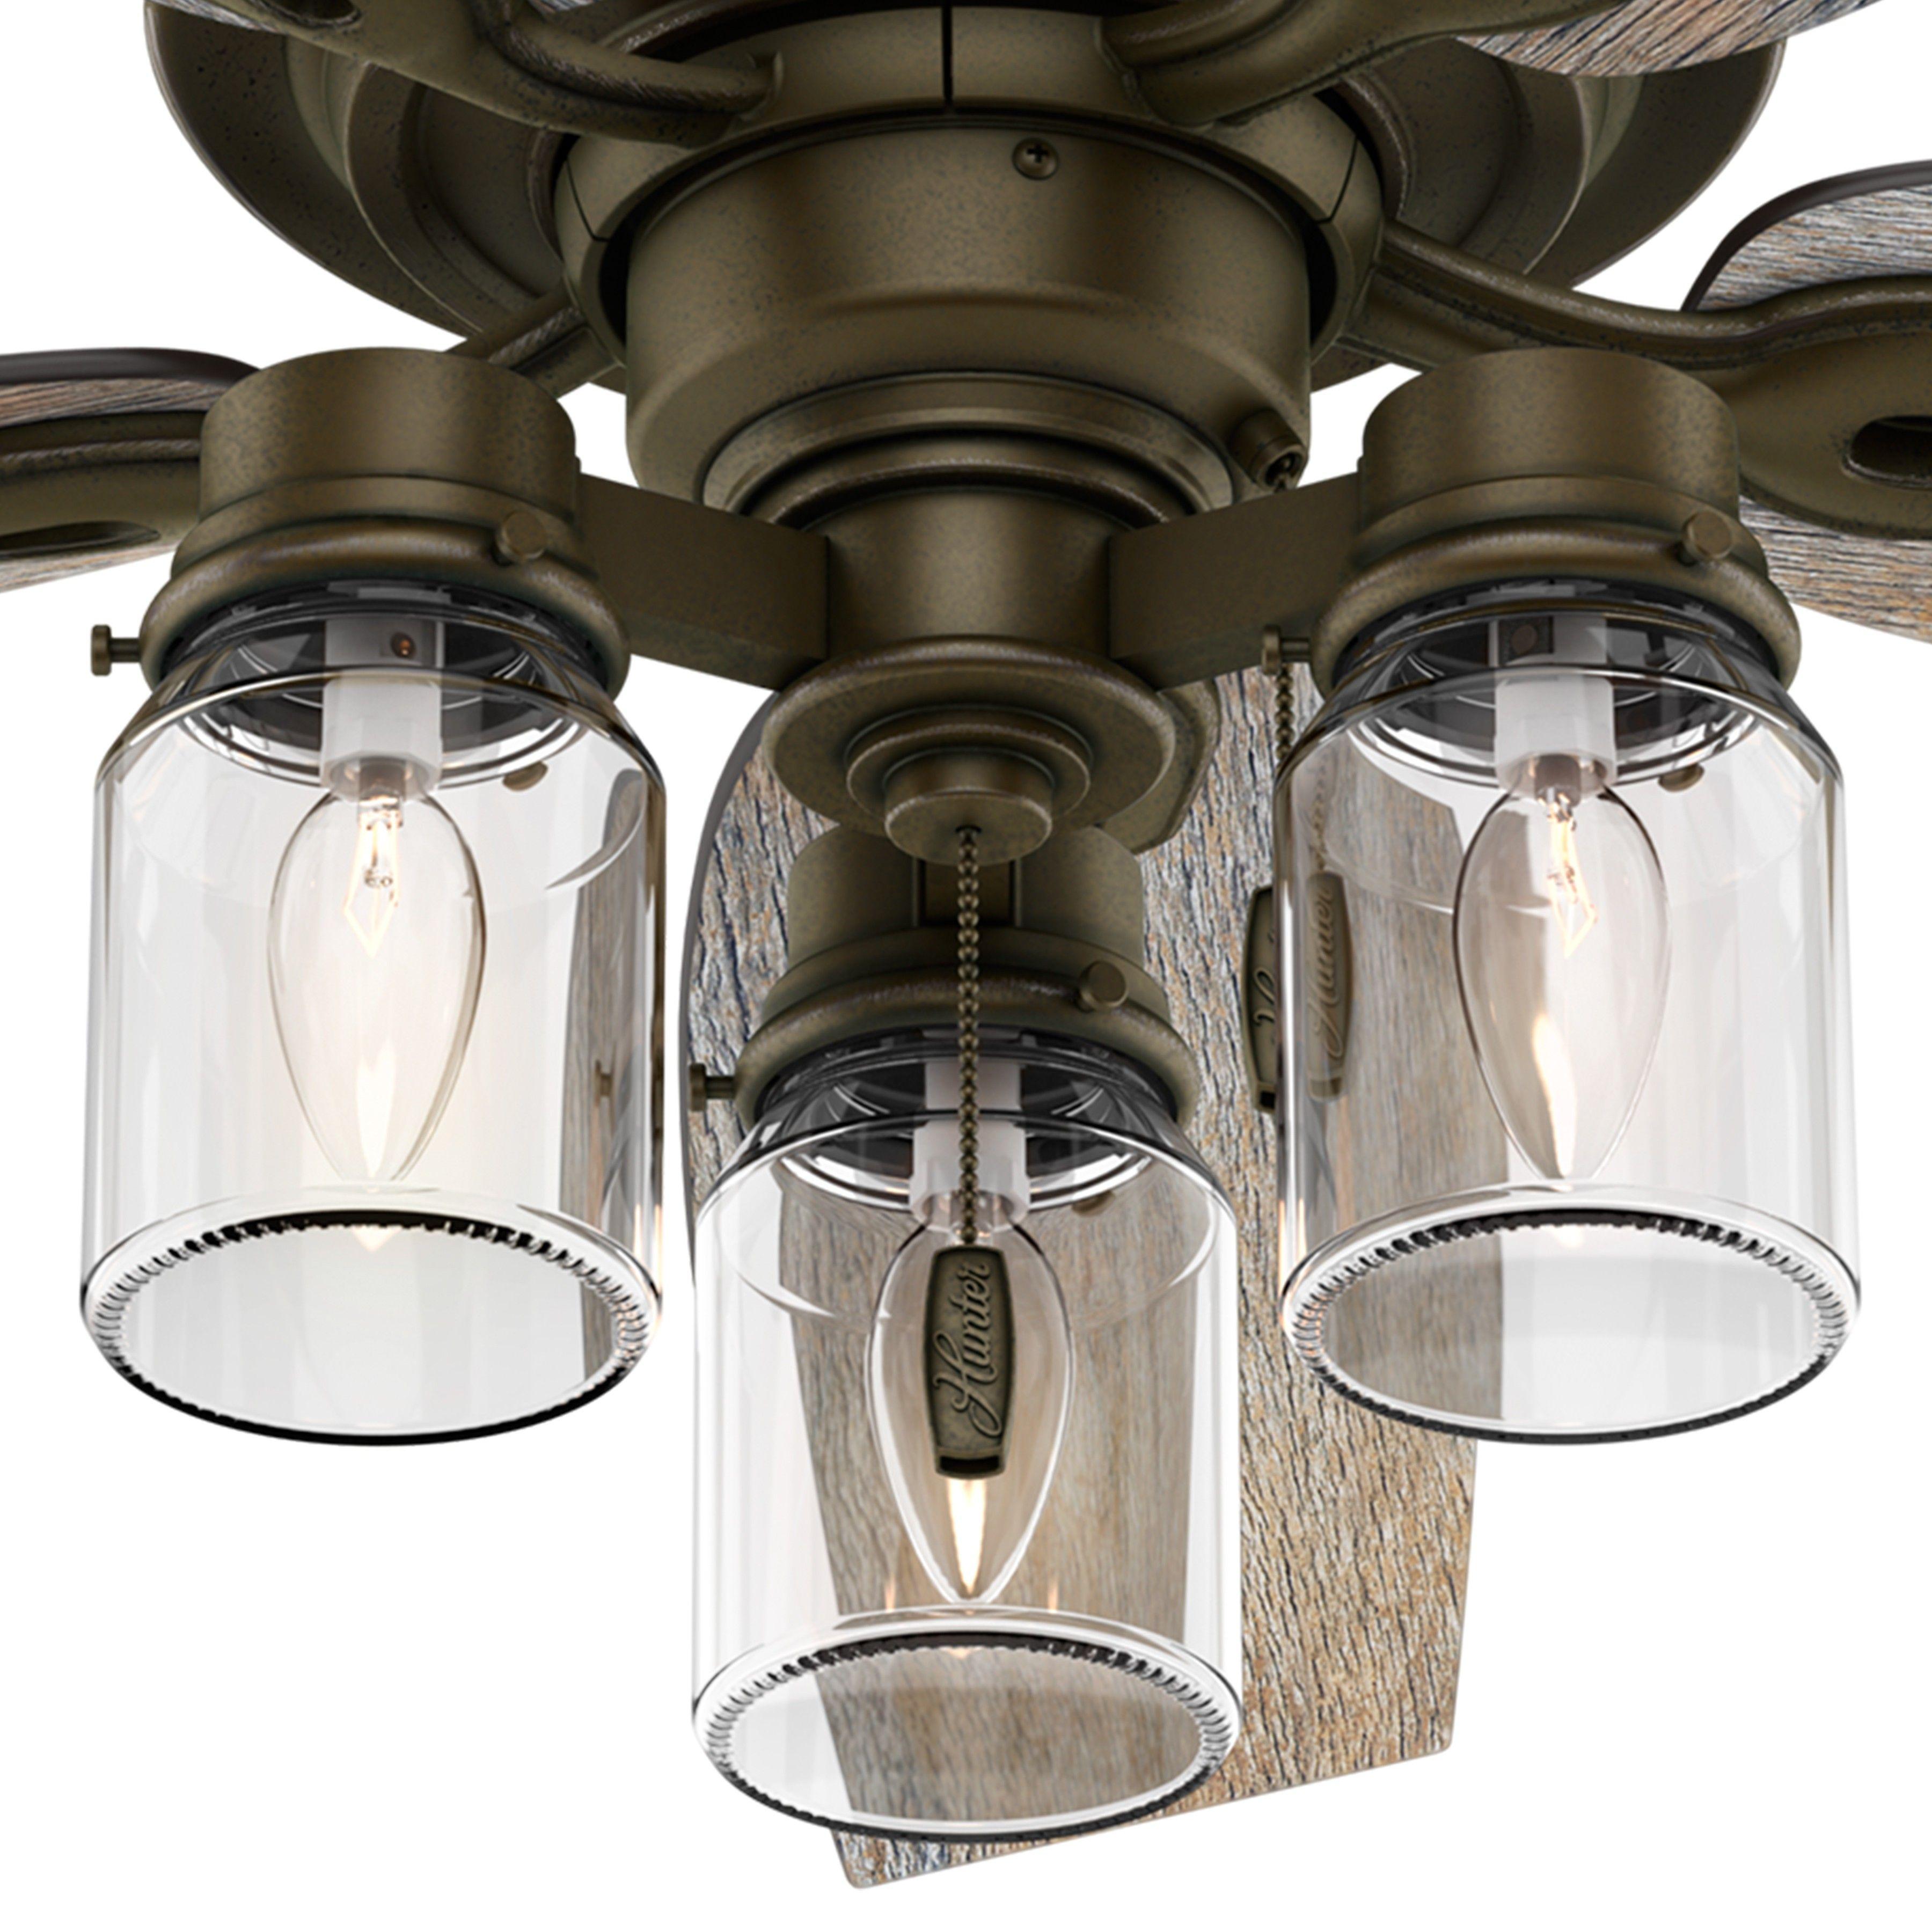 Hunter Fan 52 Regal Bronze Ceiling Fan Includes Three Light Fitter With Clear Glass Bronze Ceiling Fan Ceiling Fan With Light Ceiling Fan Light Kit